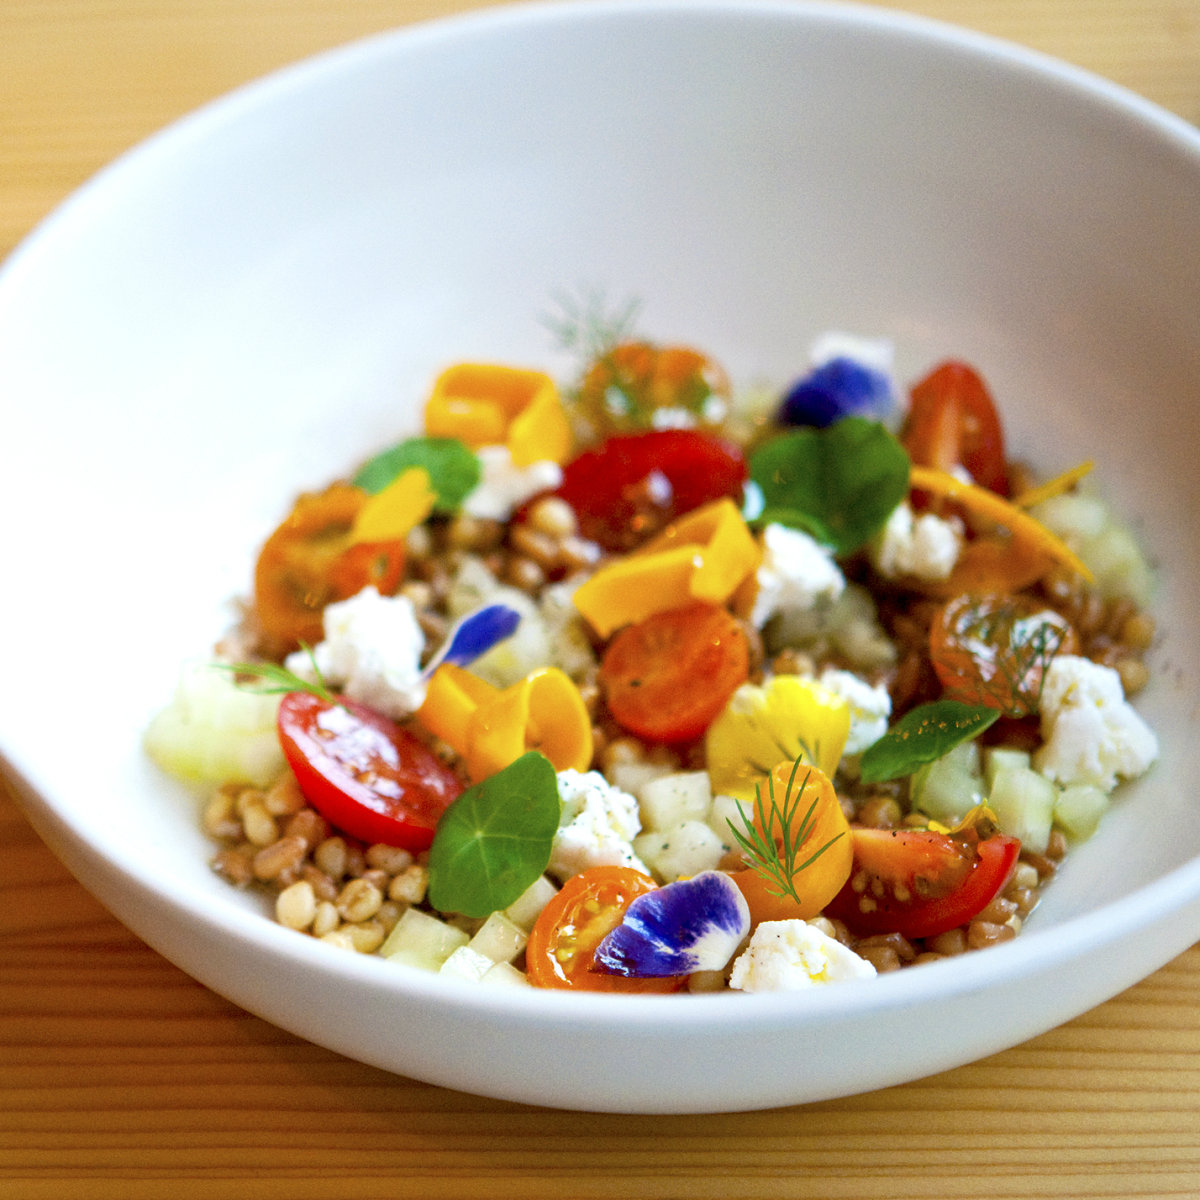 Emmer and Rye 2015 Austin restaurant grain salad